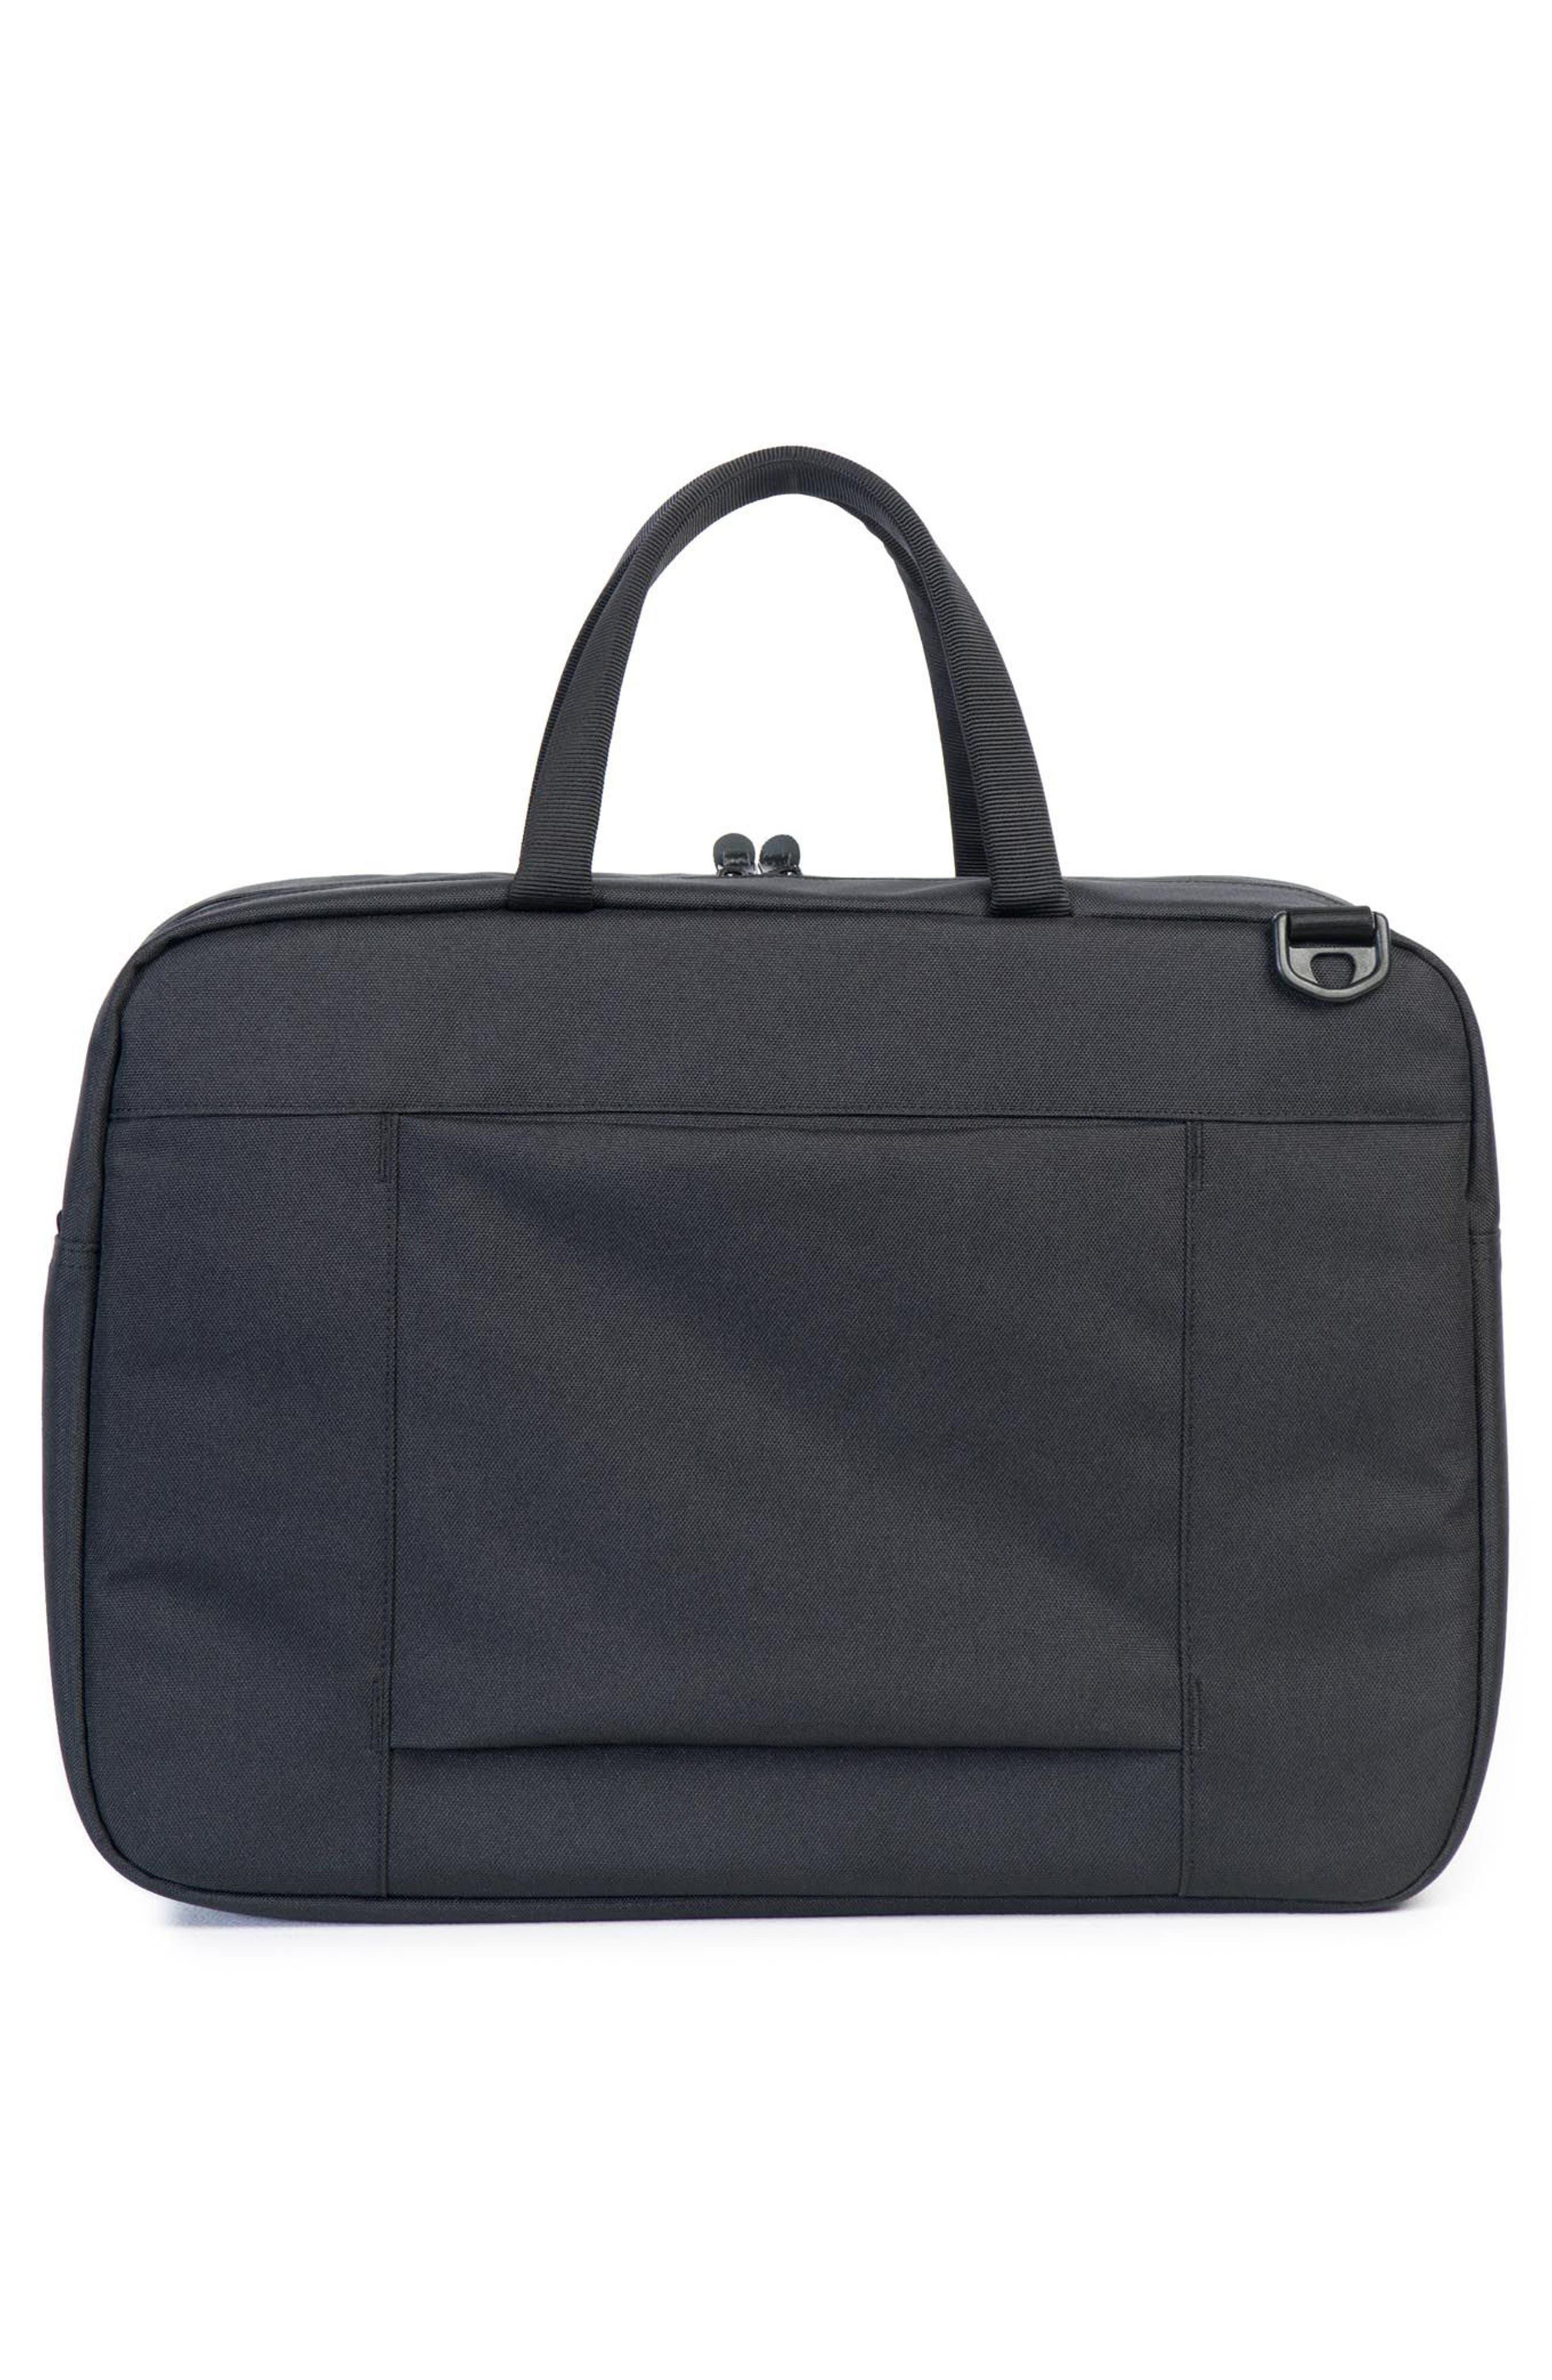 Sandford Messenger Bag,                             Alternate thumbnail 2, color,                             010